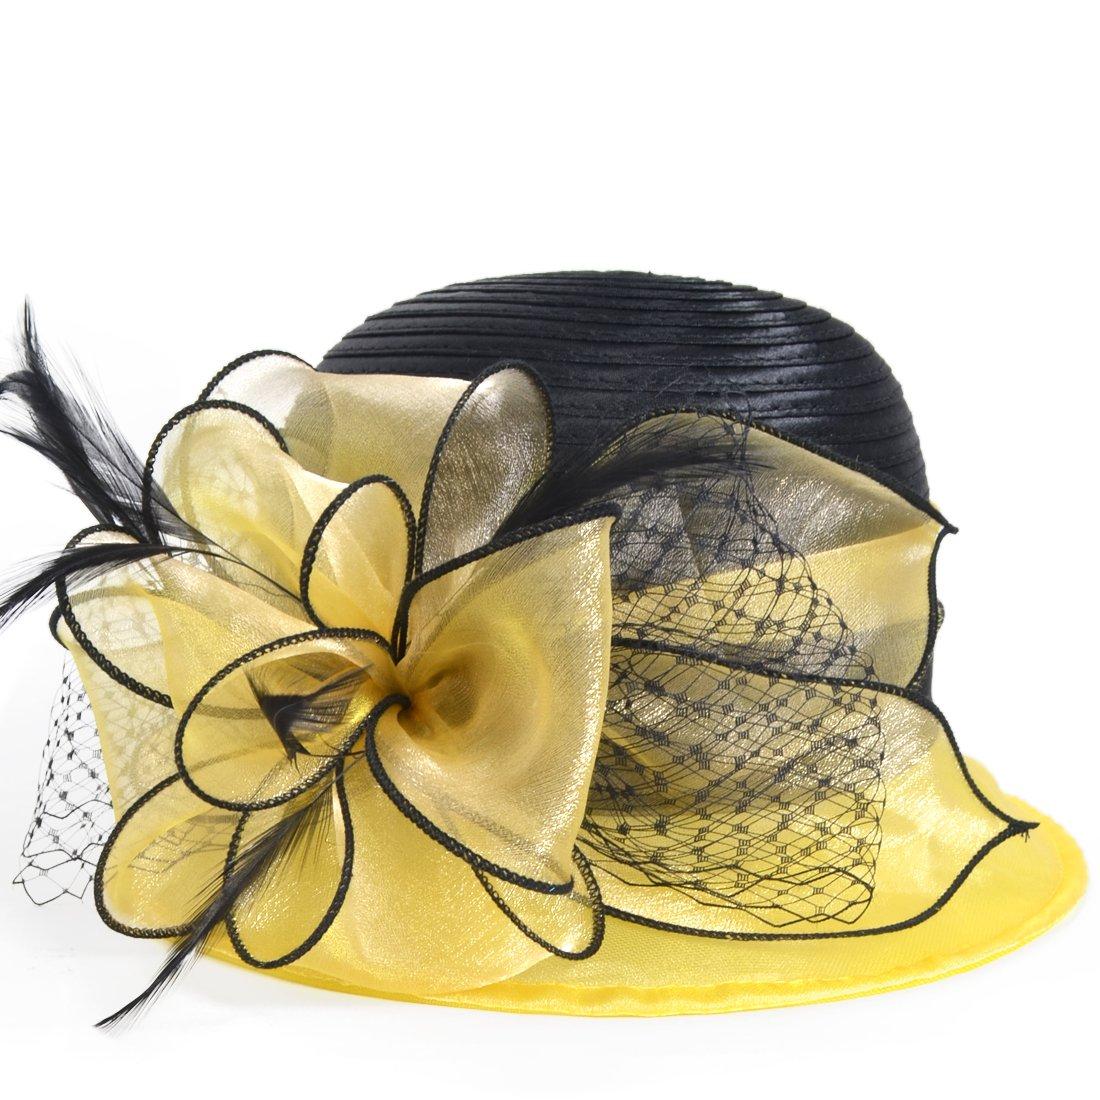 HISSHE Sweet Cute Cloche Oaks Church Dress Bowler Derby Wedding Hat Party S606-A, Yellow, Medium by HISSHE (Image #1)